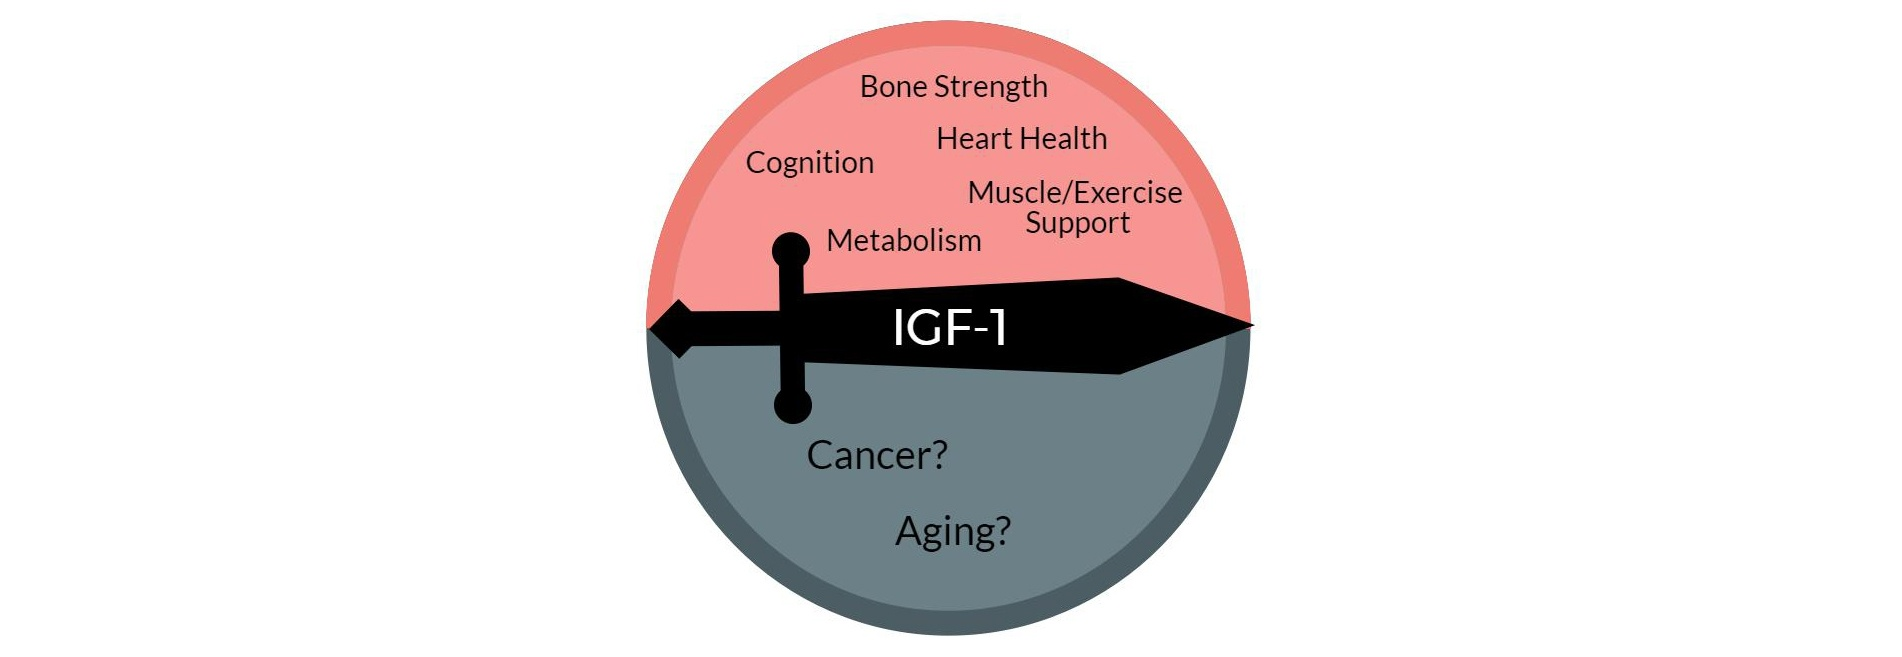 ketogenic diet and igf-1 igfbp-1